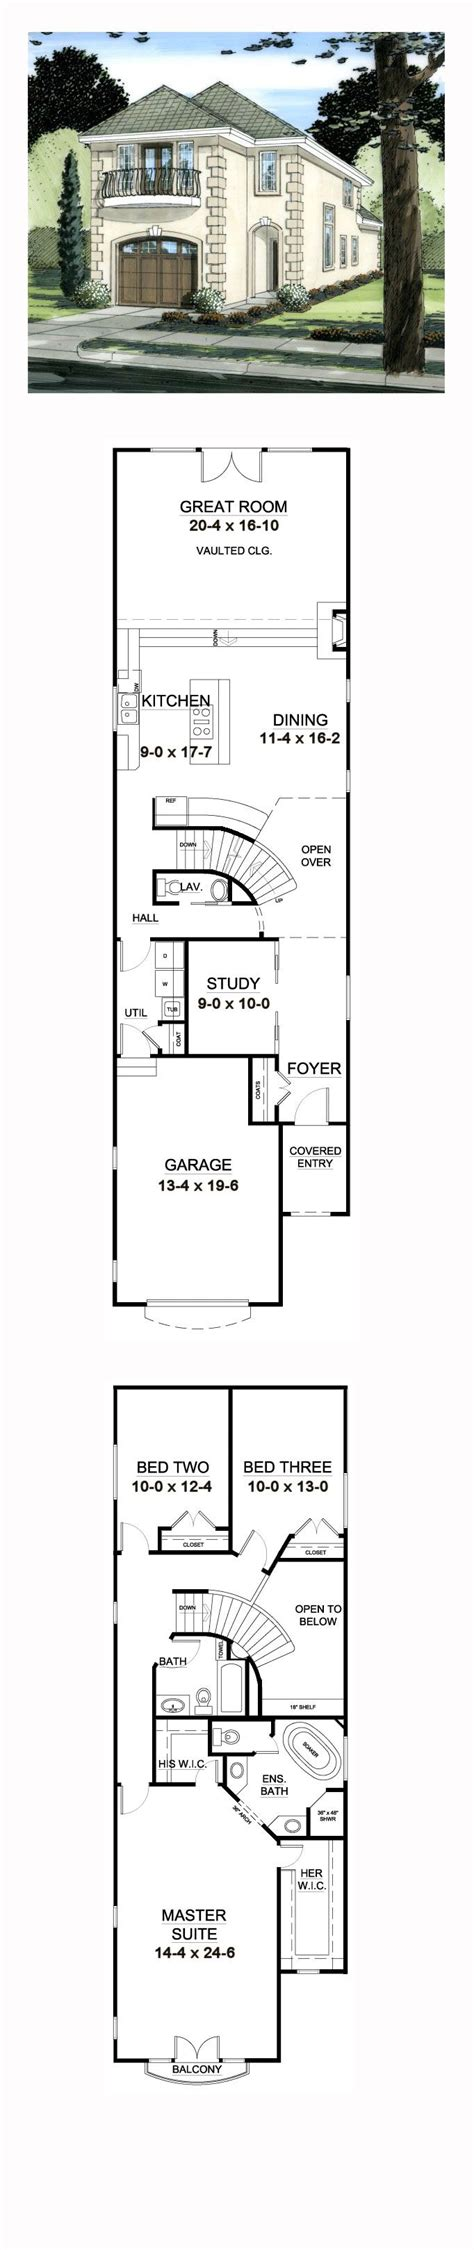 25+ Best Ideas About Narrow House Plans On Pinterest